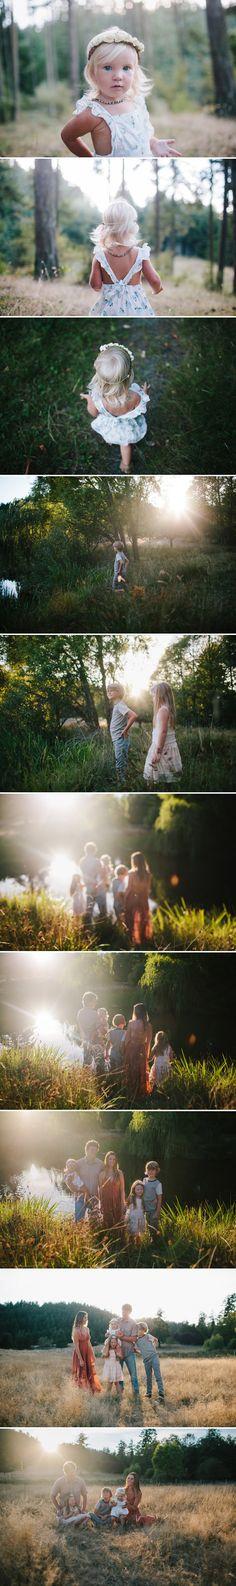 the waldron family – Sara Parsons Photography Lifestyle Photography, Children Photography, Family Photography, Photography Poses, Family Posing, Family Portraits, Family Photos, Kid Photos, Portrait Inspiration